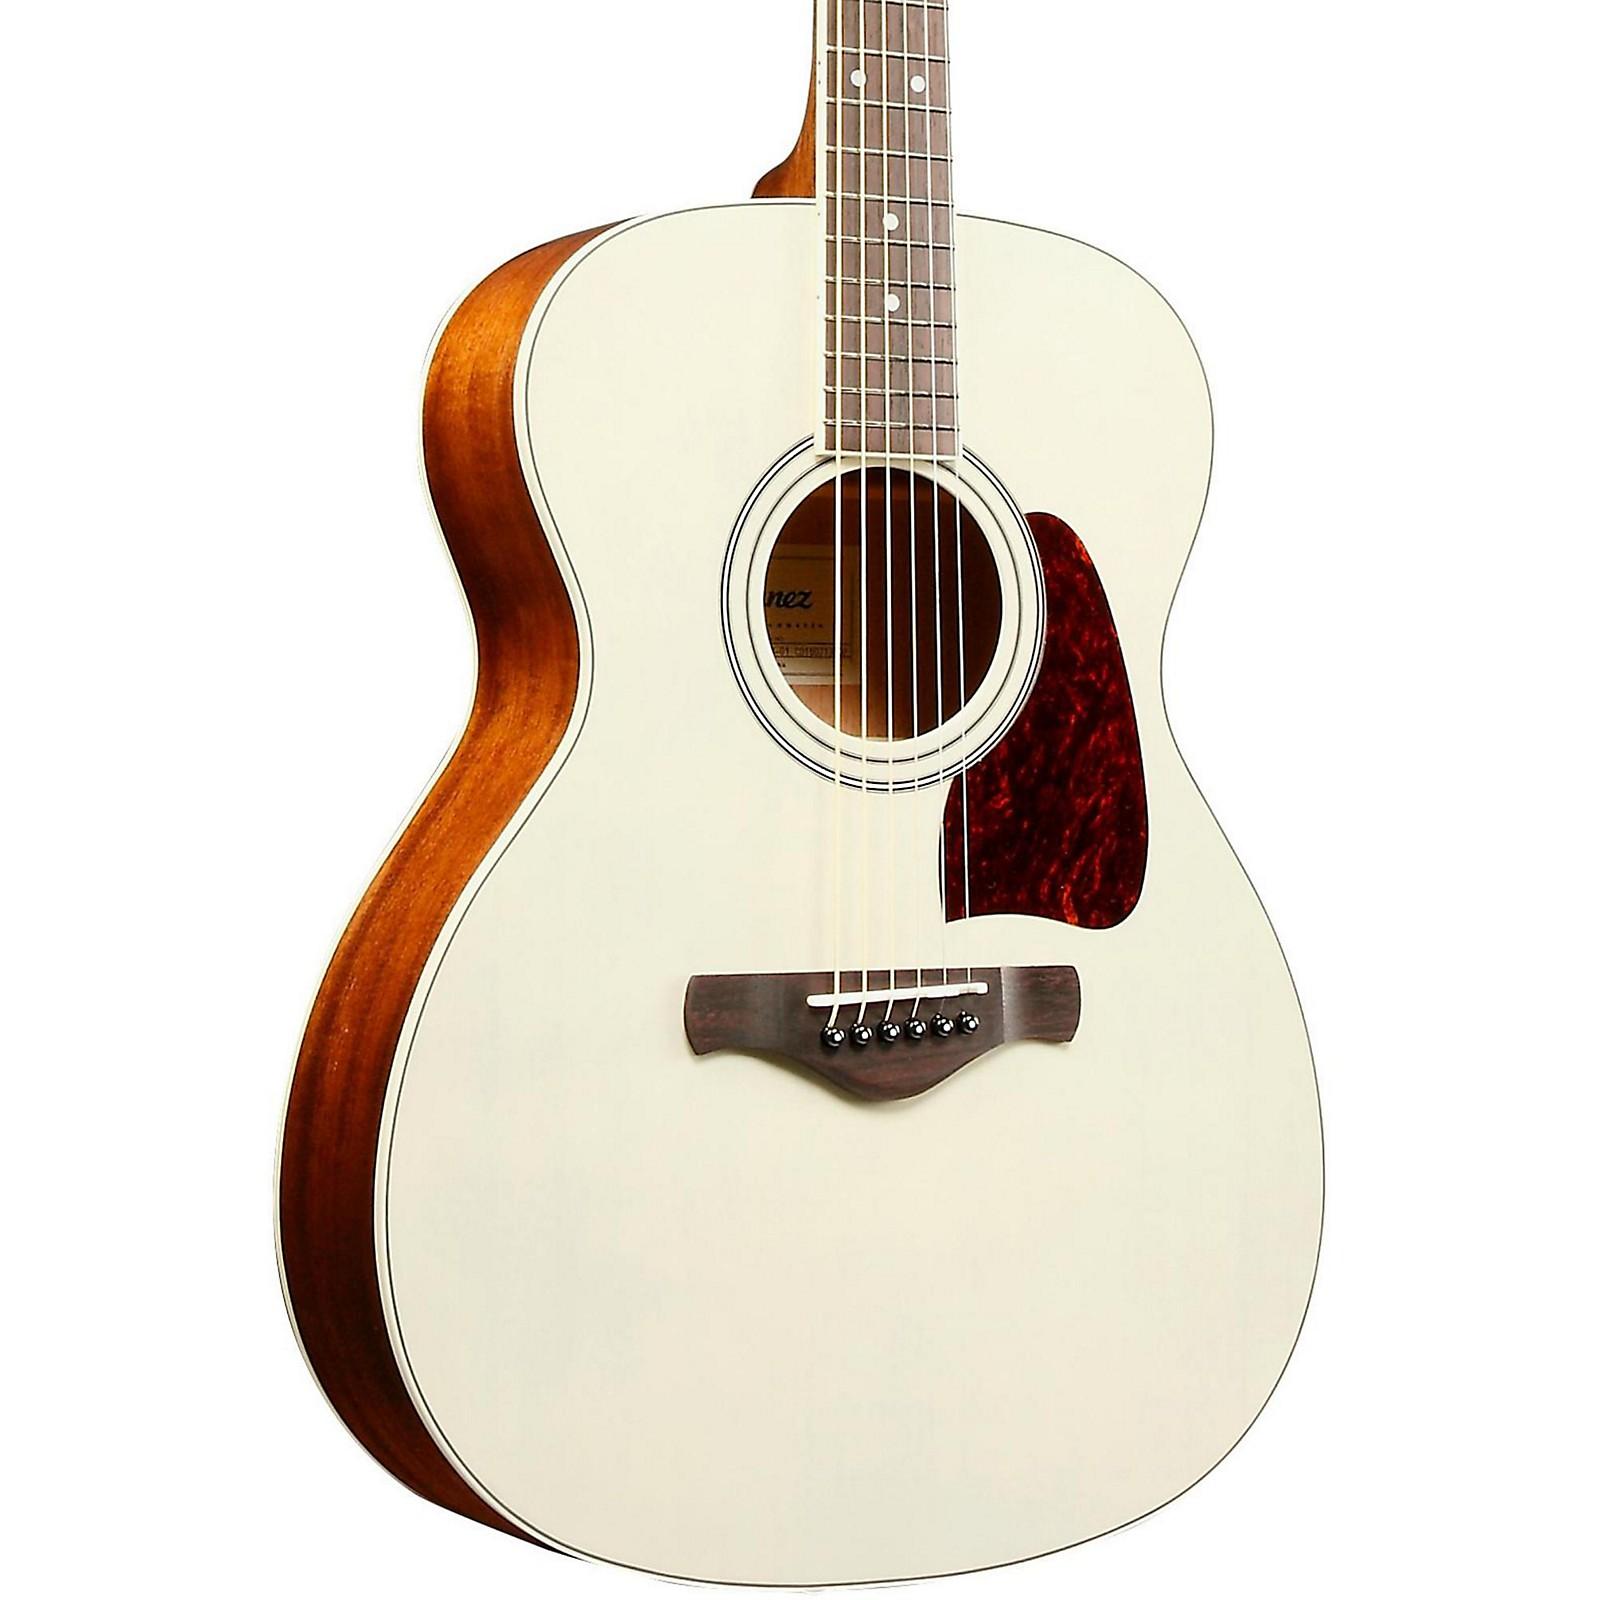 Ibanez AC320ABL Solid Top Grand Concert Acoustic Guitar